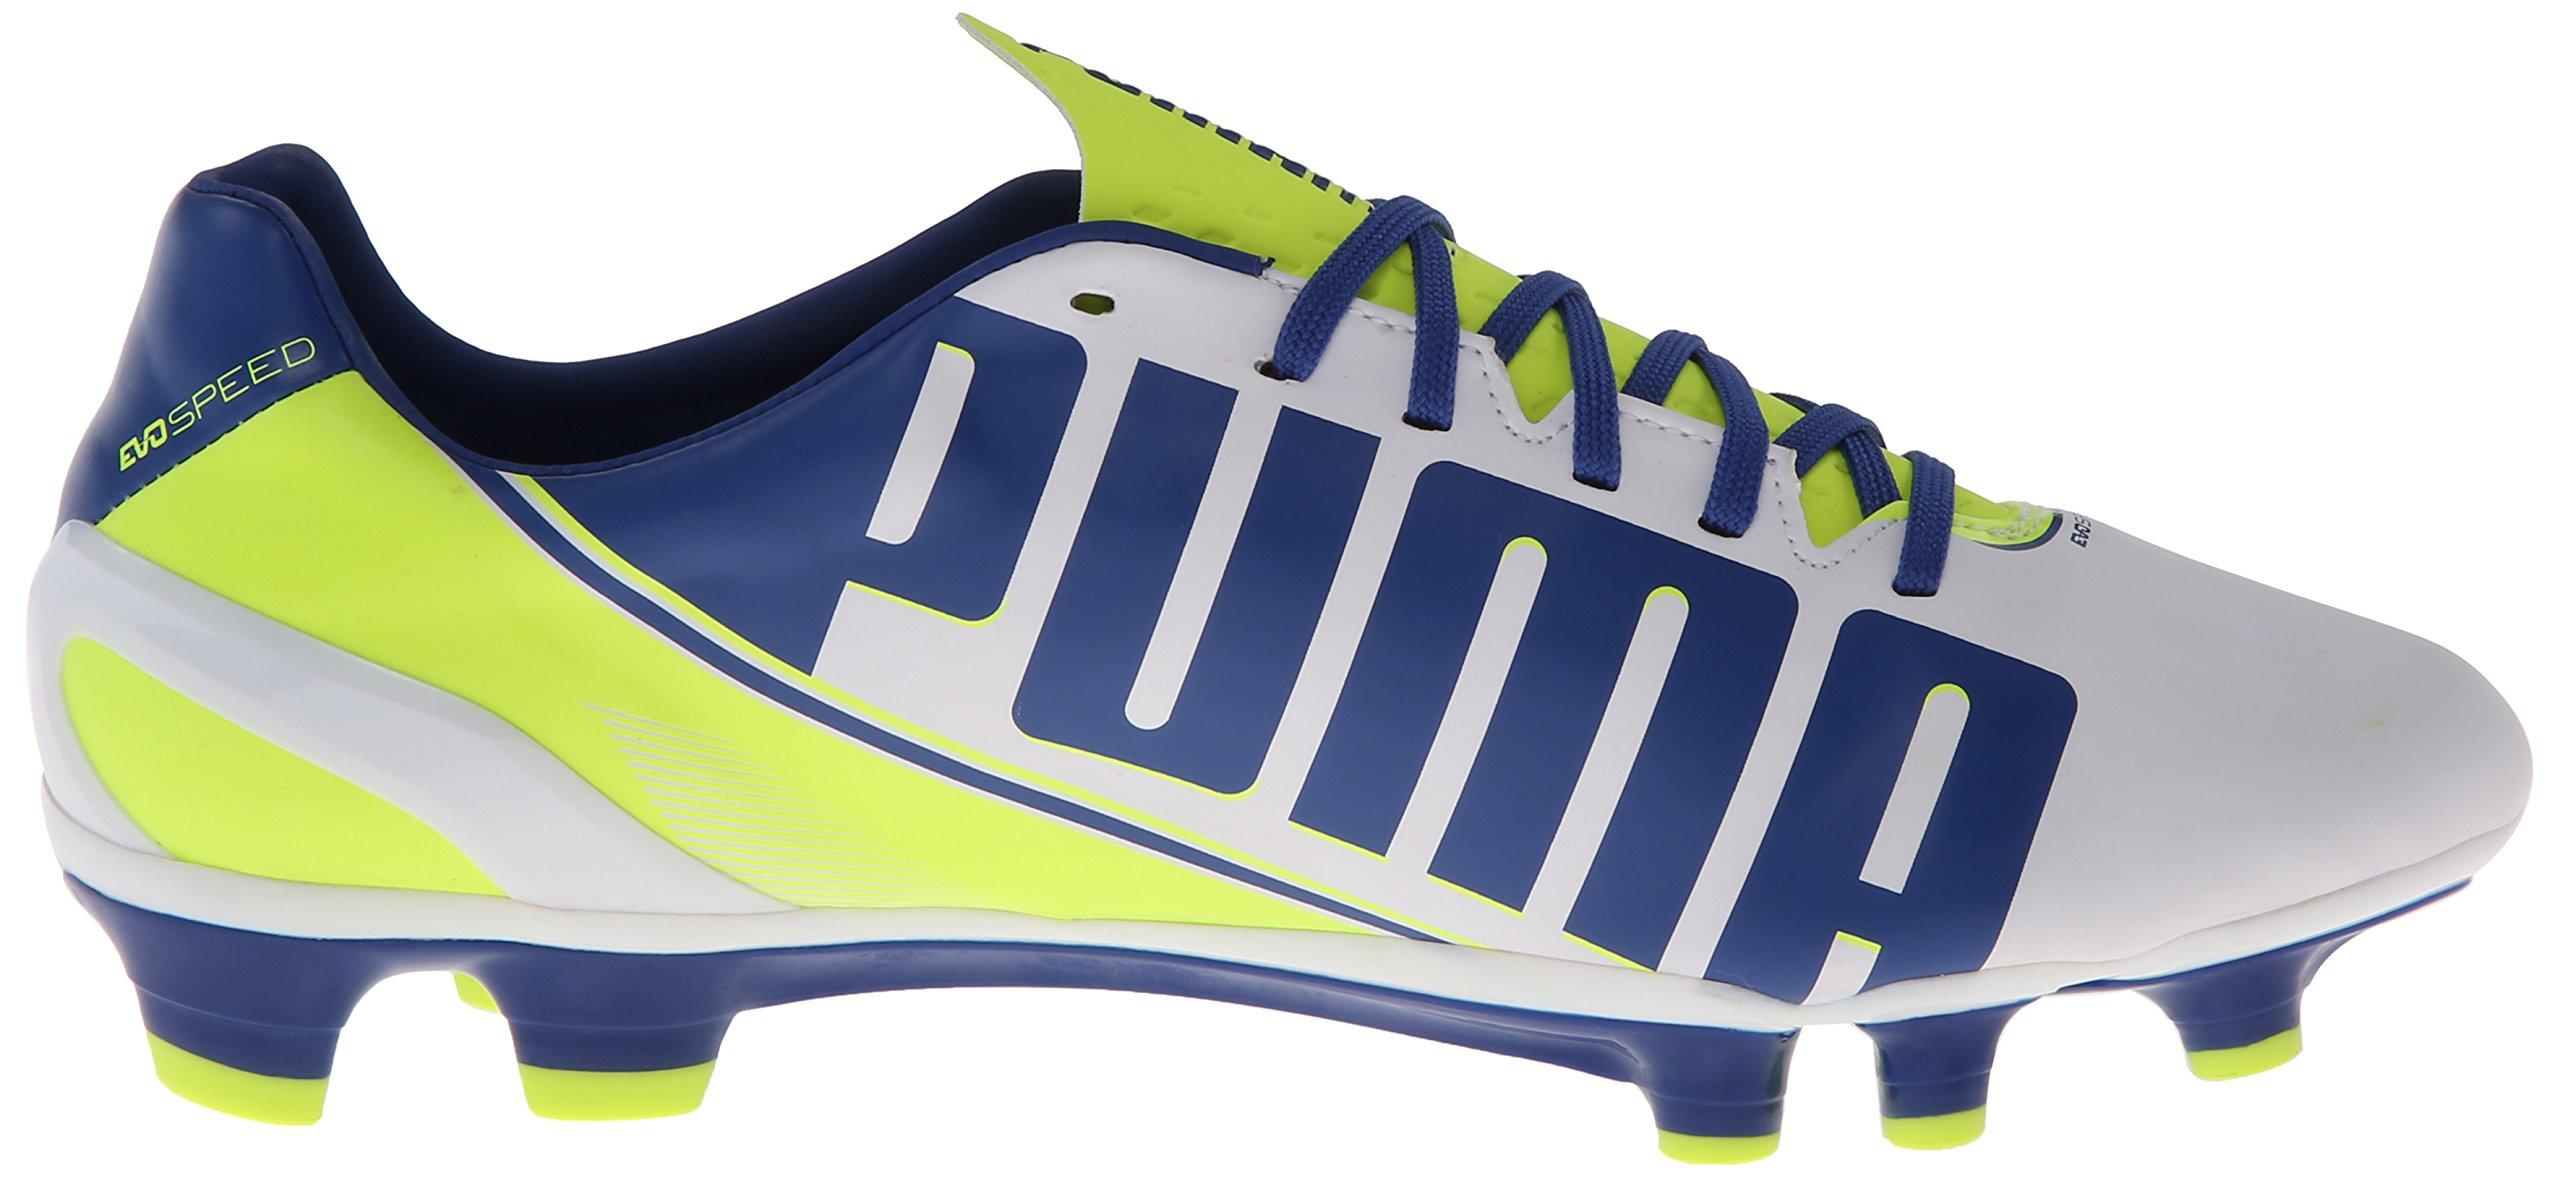 PUMA Women's Evo Speed 3.3 Firm Ground Soccer Shoe,White/Snorkel Blue/Fluorescent Yellow,8 B US by PUMA (Image #7)